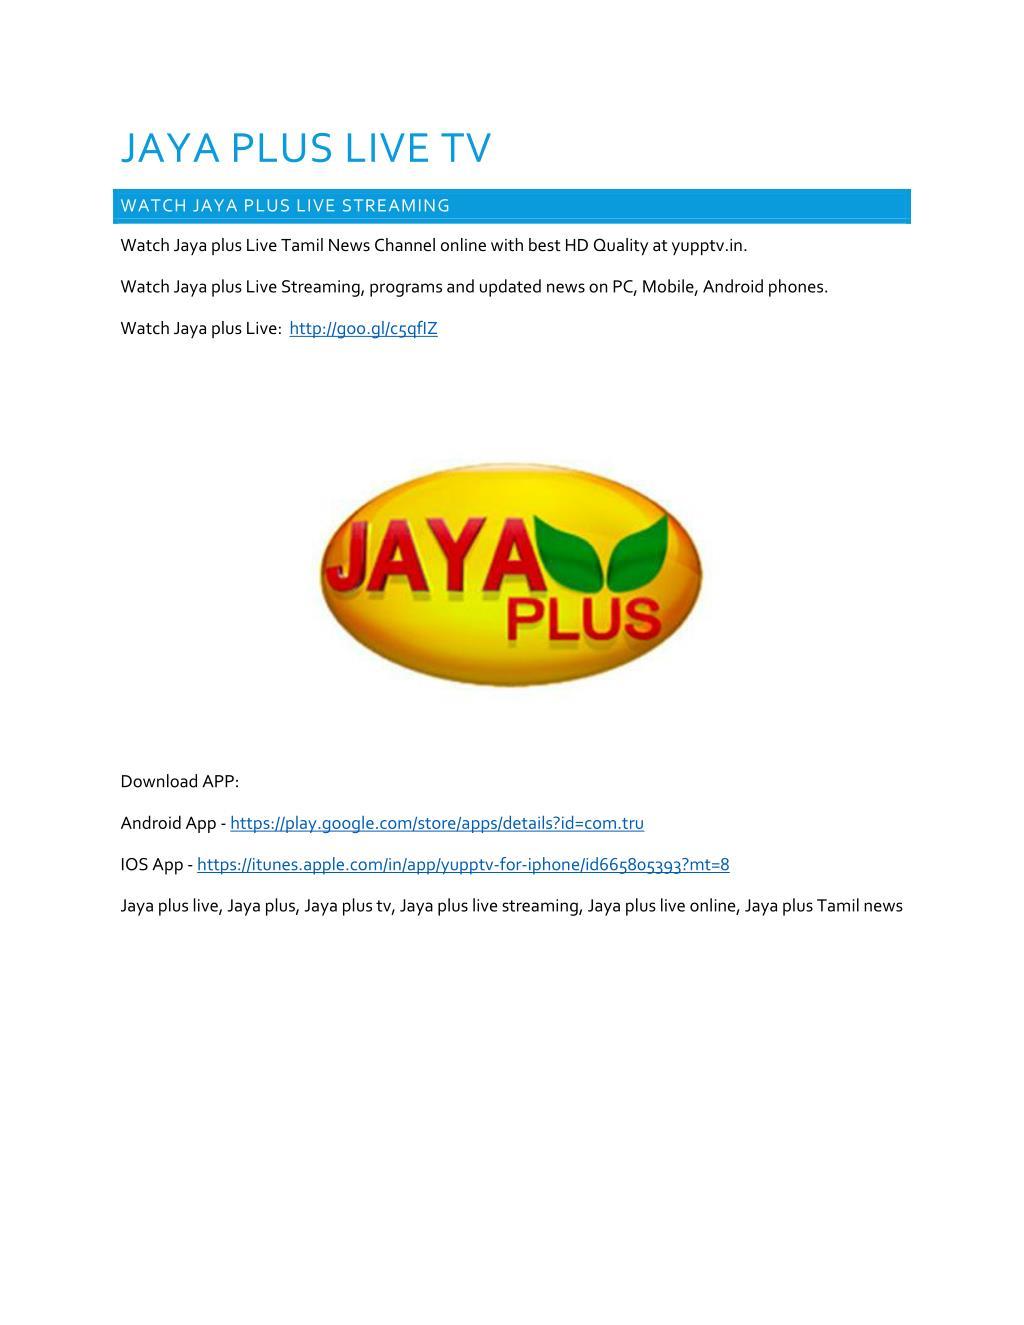 PPT - JAYA PLUS LIVE TV PowerPoint Presentation - ID:7216649